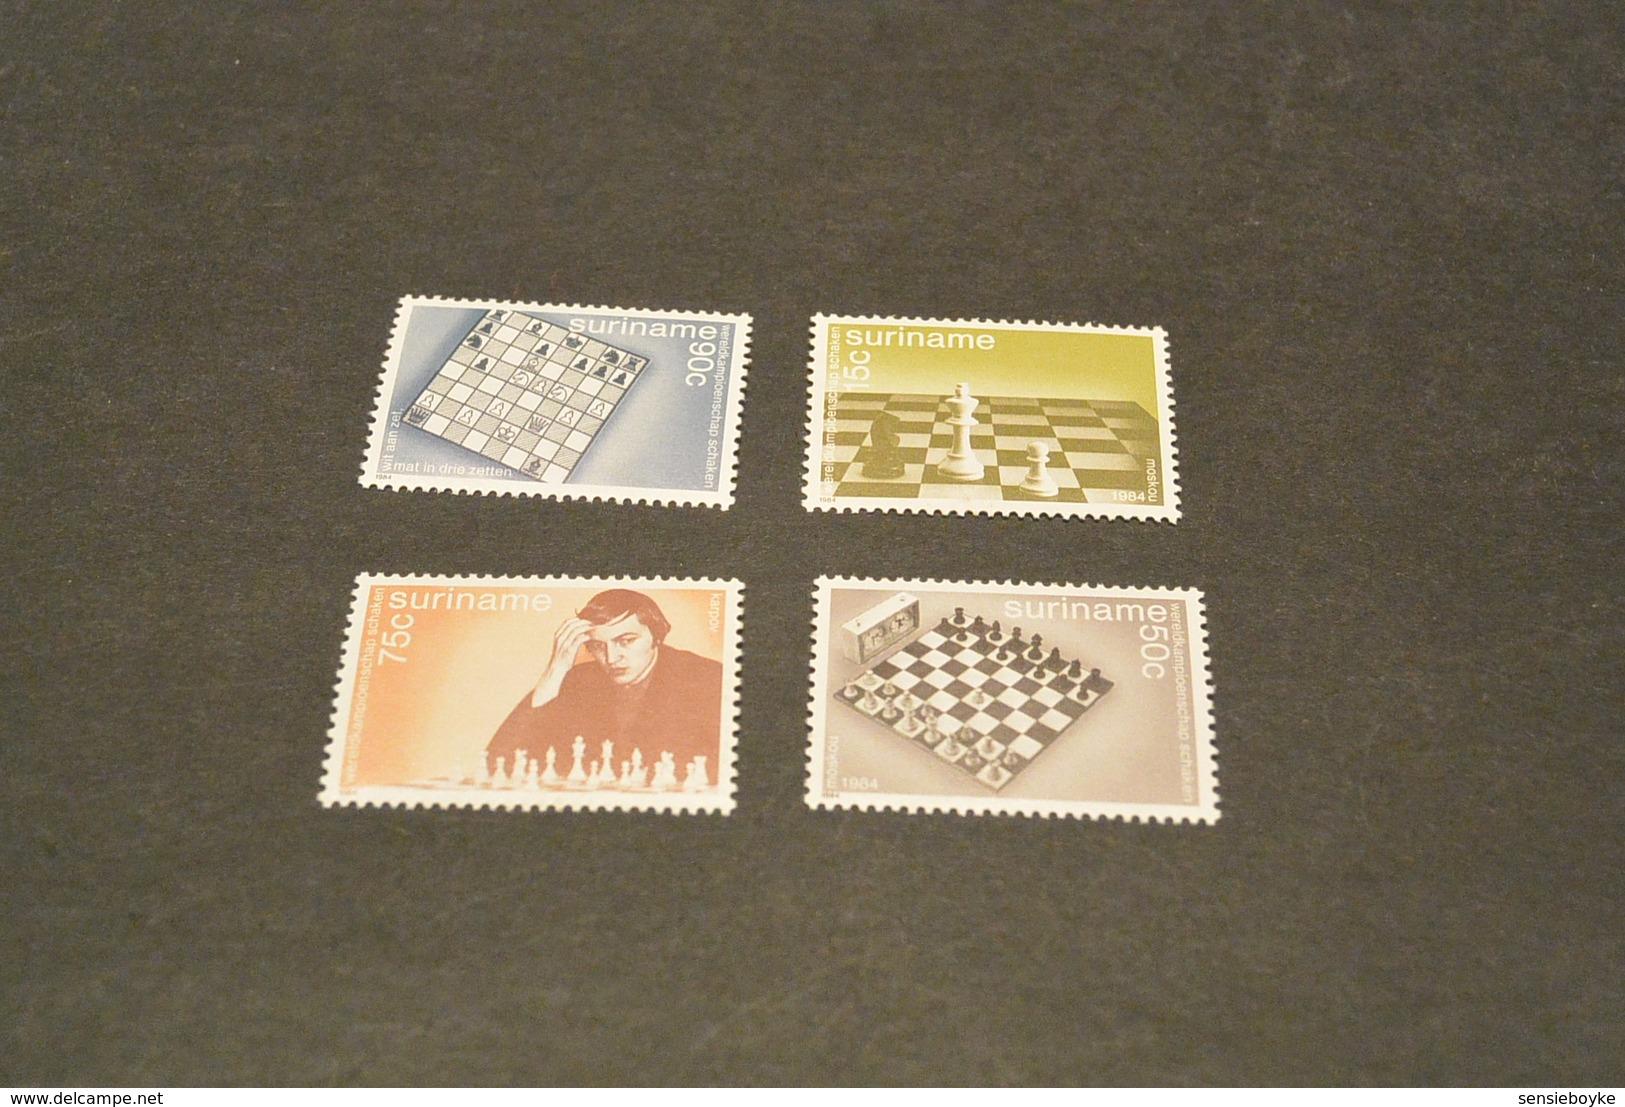 K13421- Stamps MNH Surinam - 1984-  World Chess Championship -Moscow - Schaken